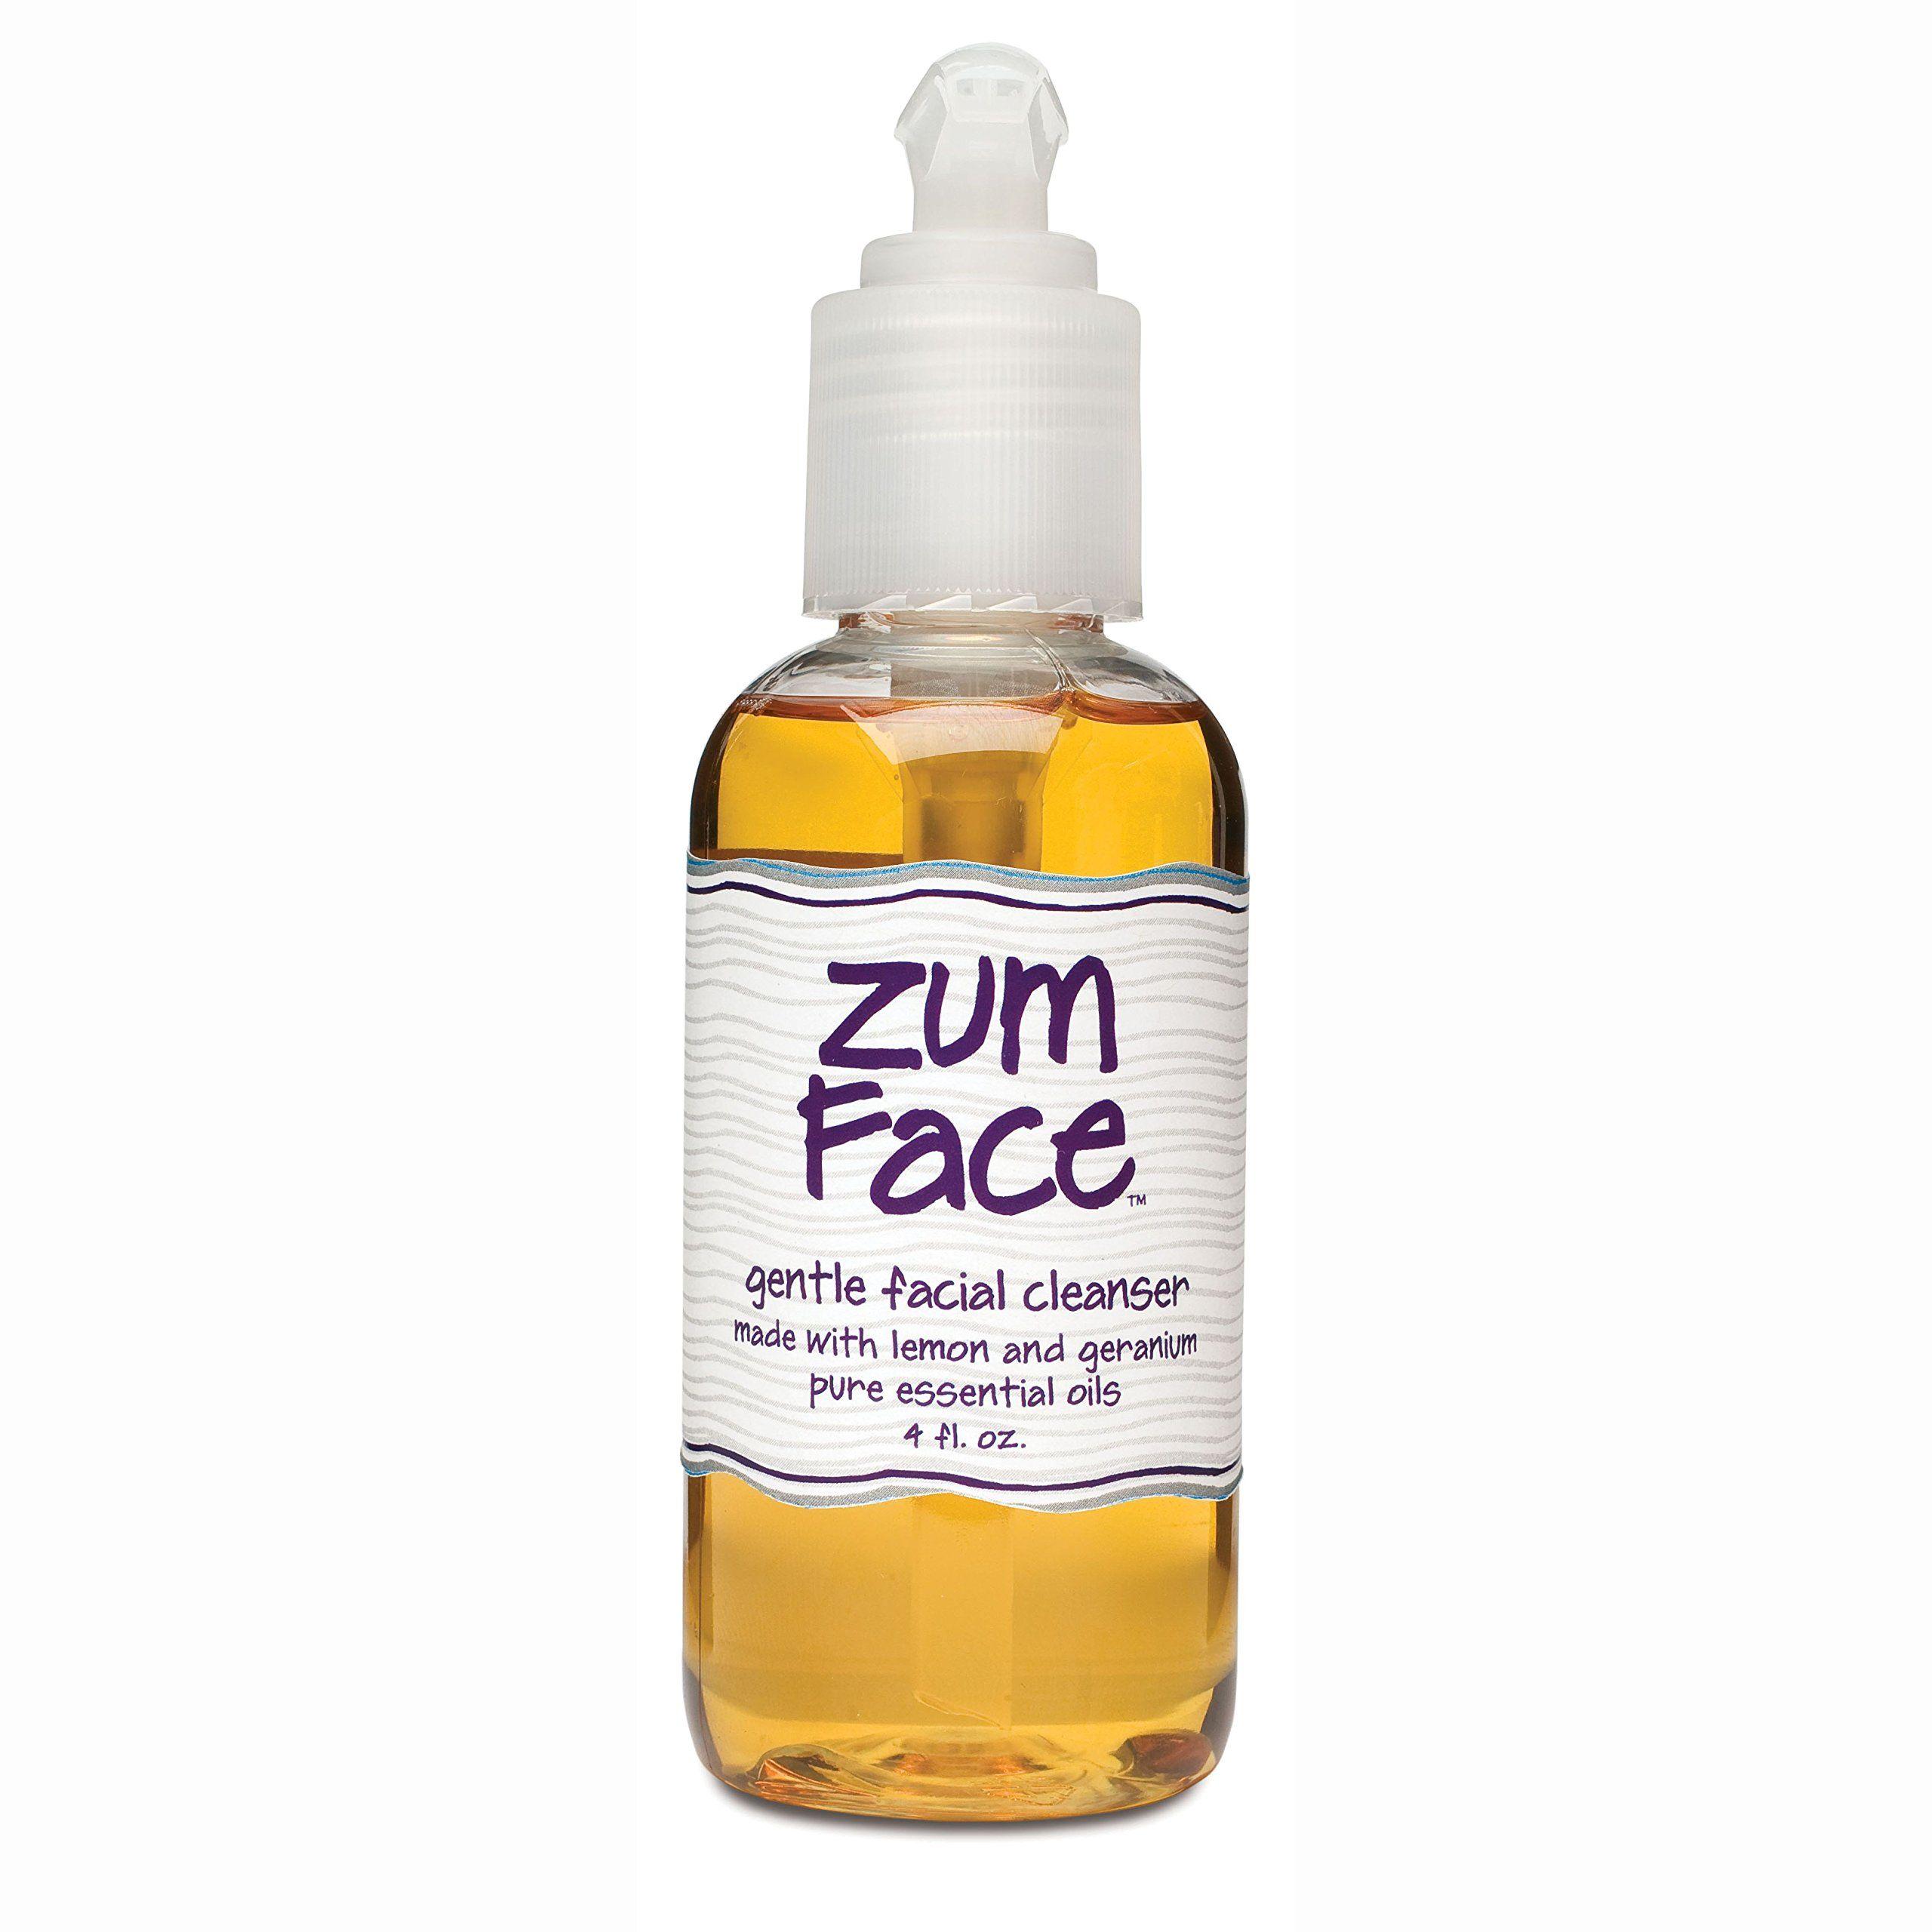 Indigo Wild Zum Face Gentle Facial Cleanser Lemon Geranium Indigo